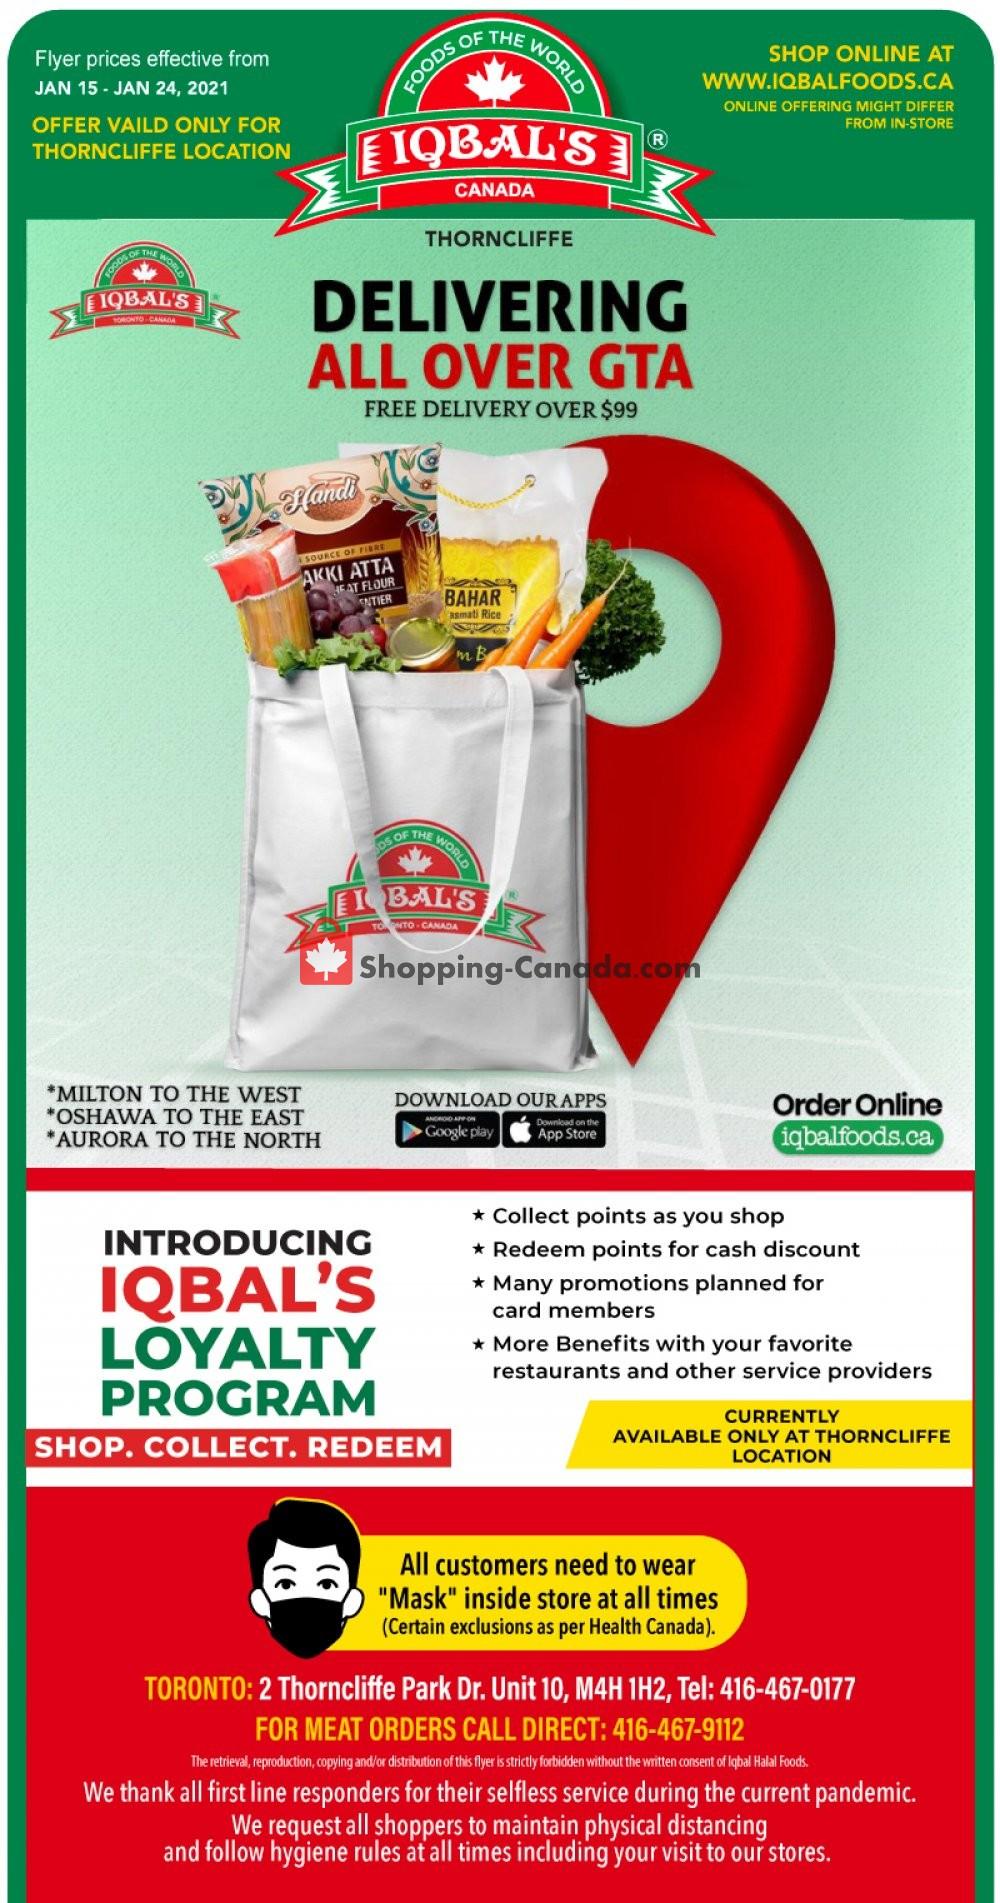 Flyer Iqbal Foods Canada - from Friday January 15, 2021 to Sunday January 24, 2021